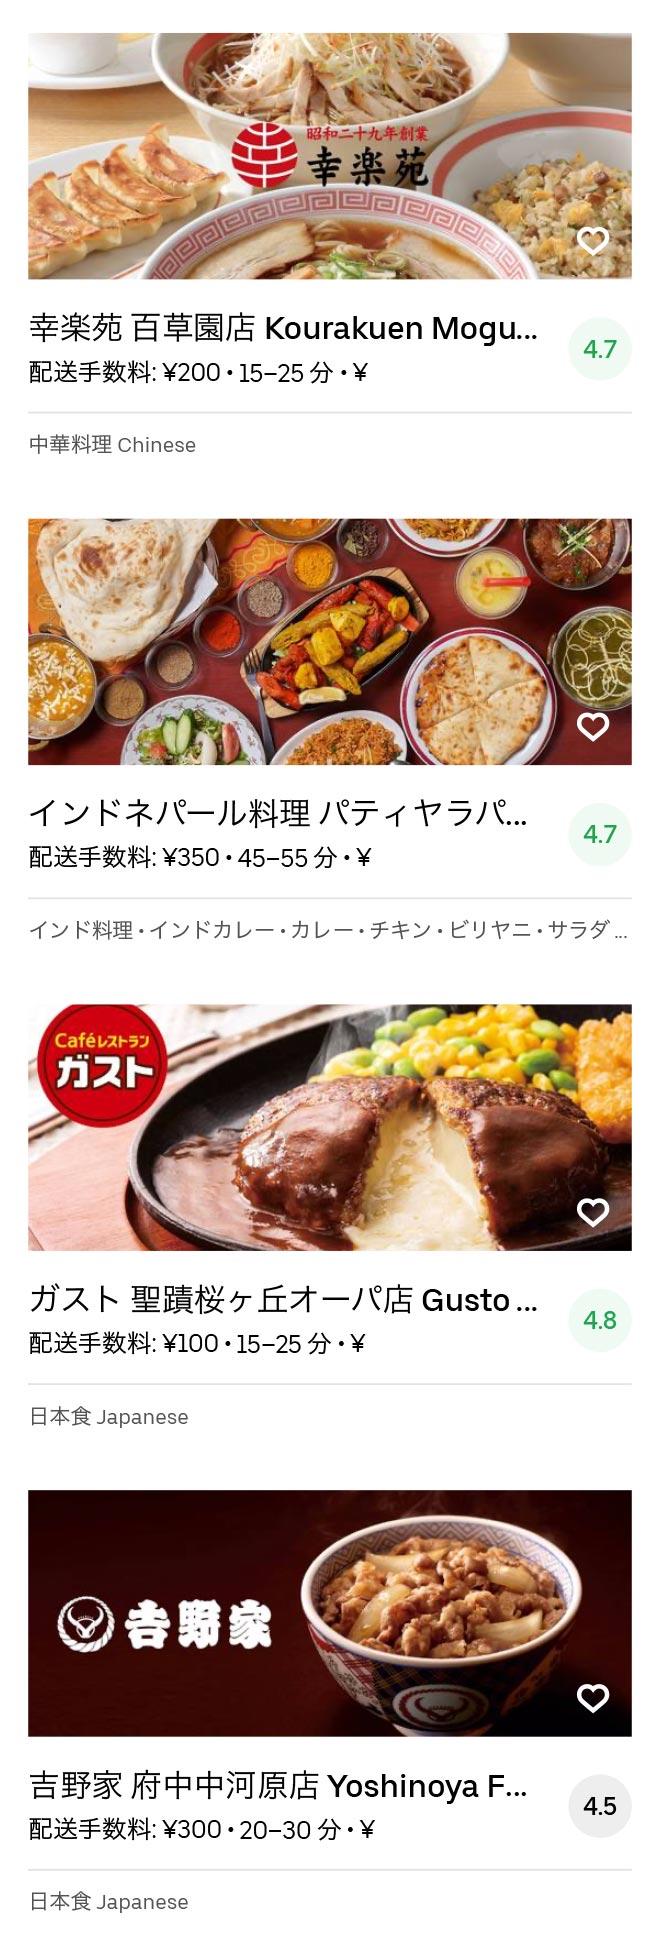 Seiseki menu 2007 04